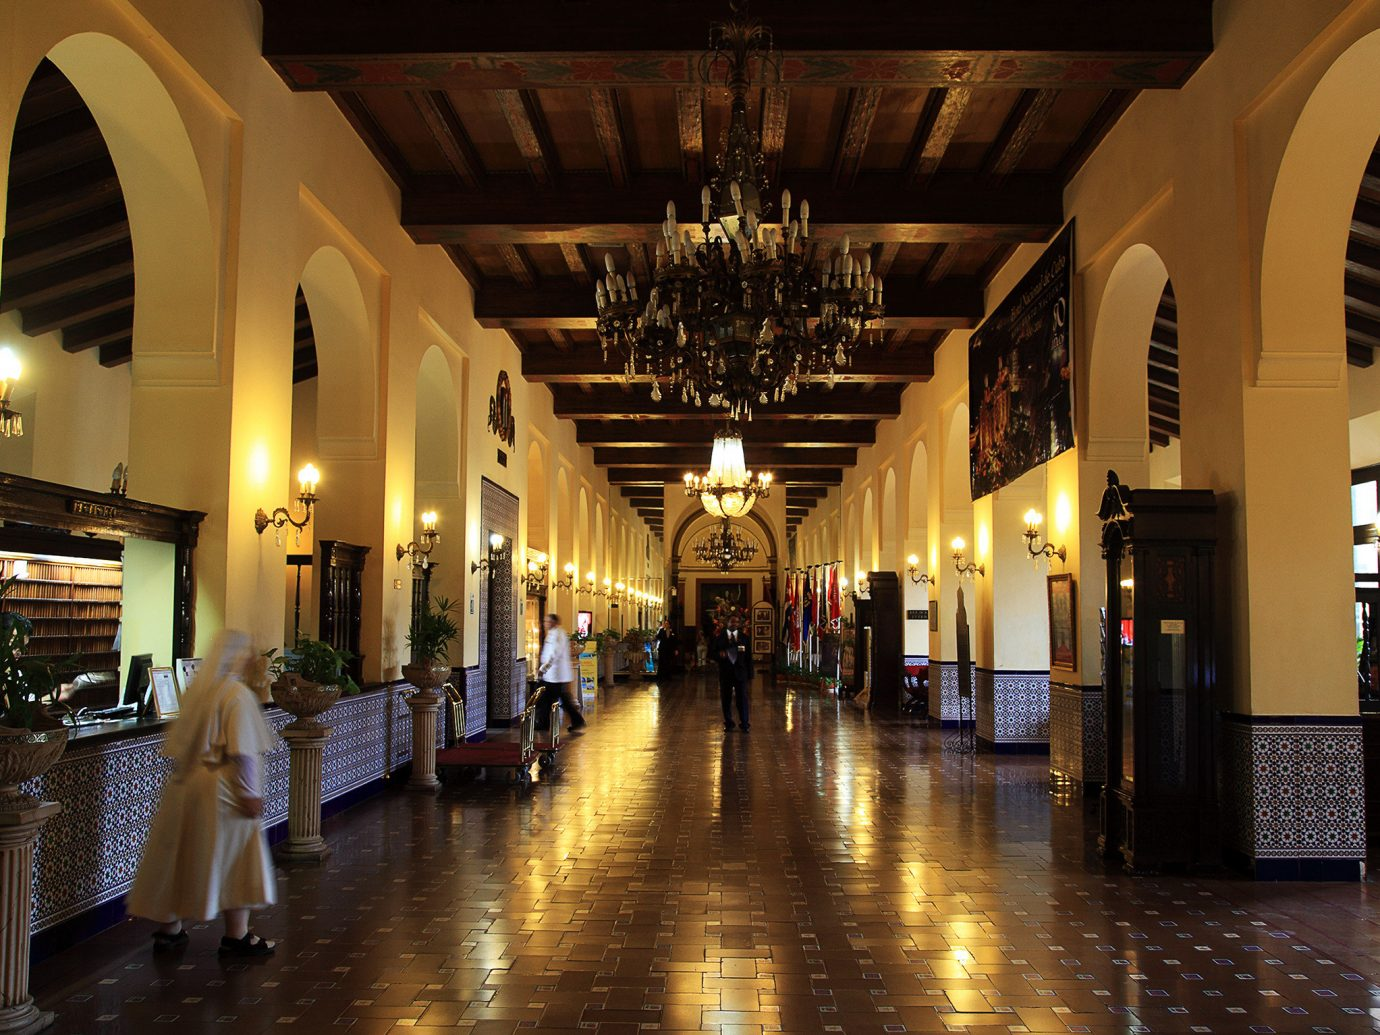 Hotels Luxury Travel Lobby lighting function hall night interior design restaurant evening hall